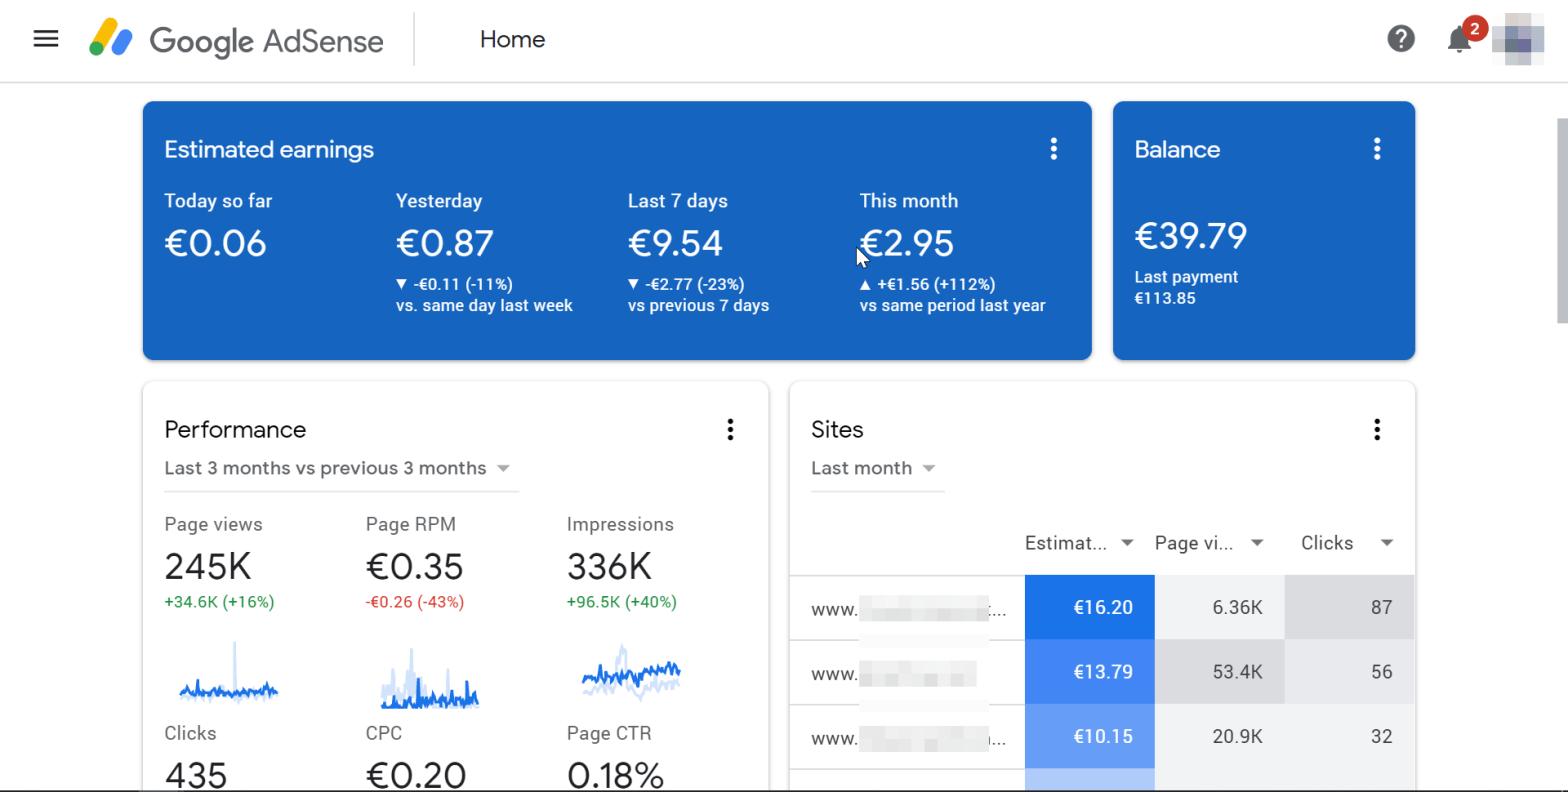 How to make money through Google AdSense?